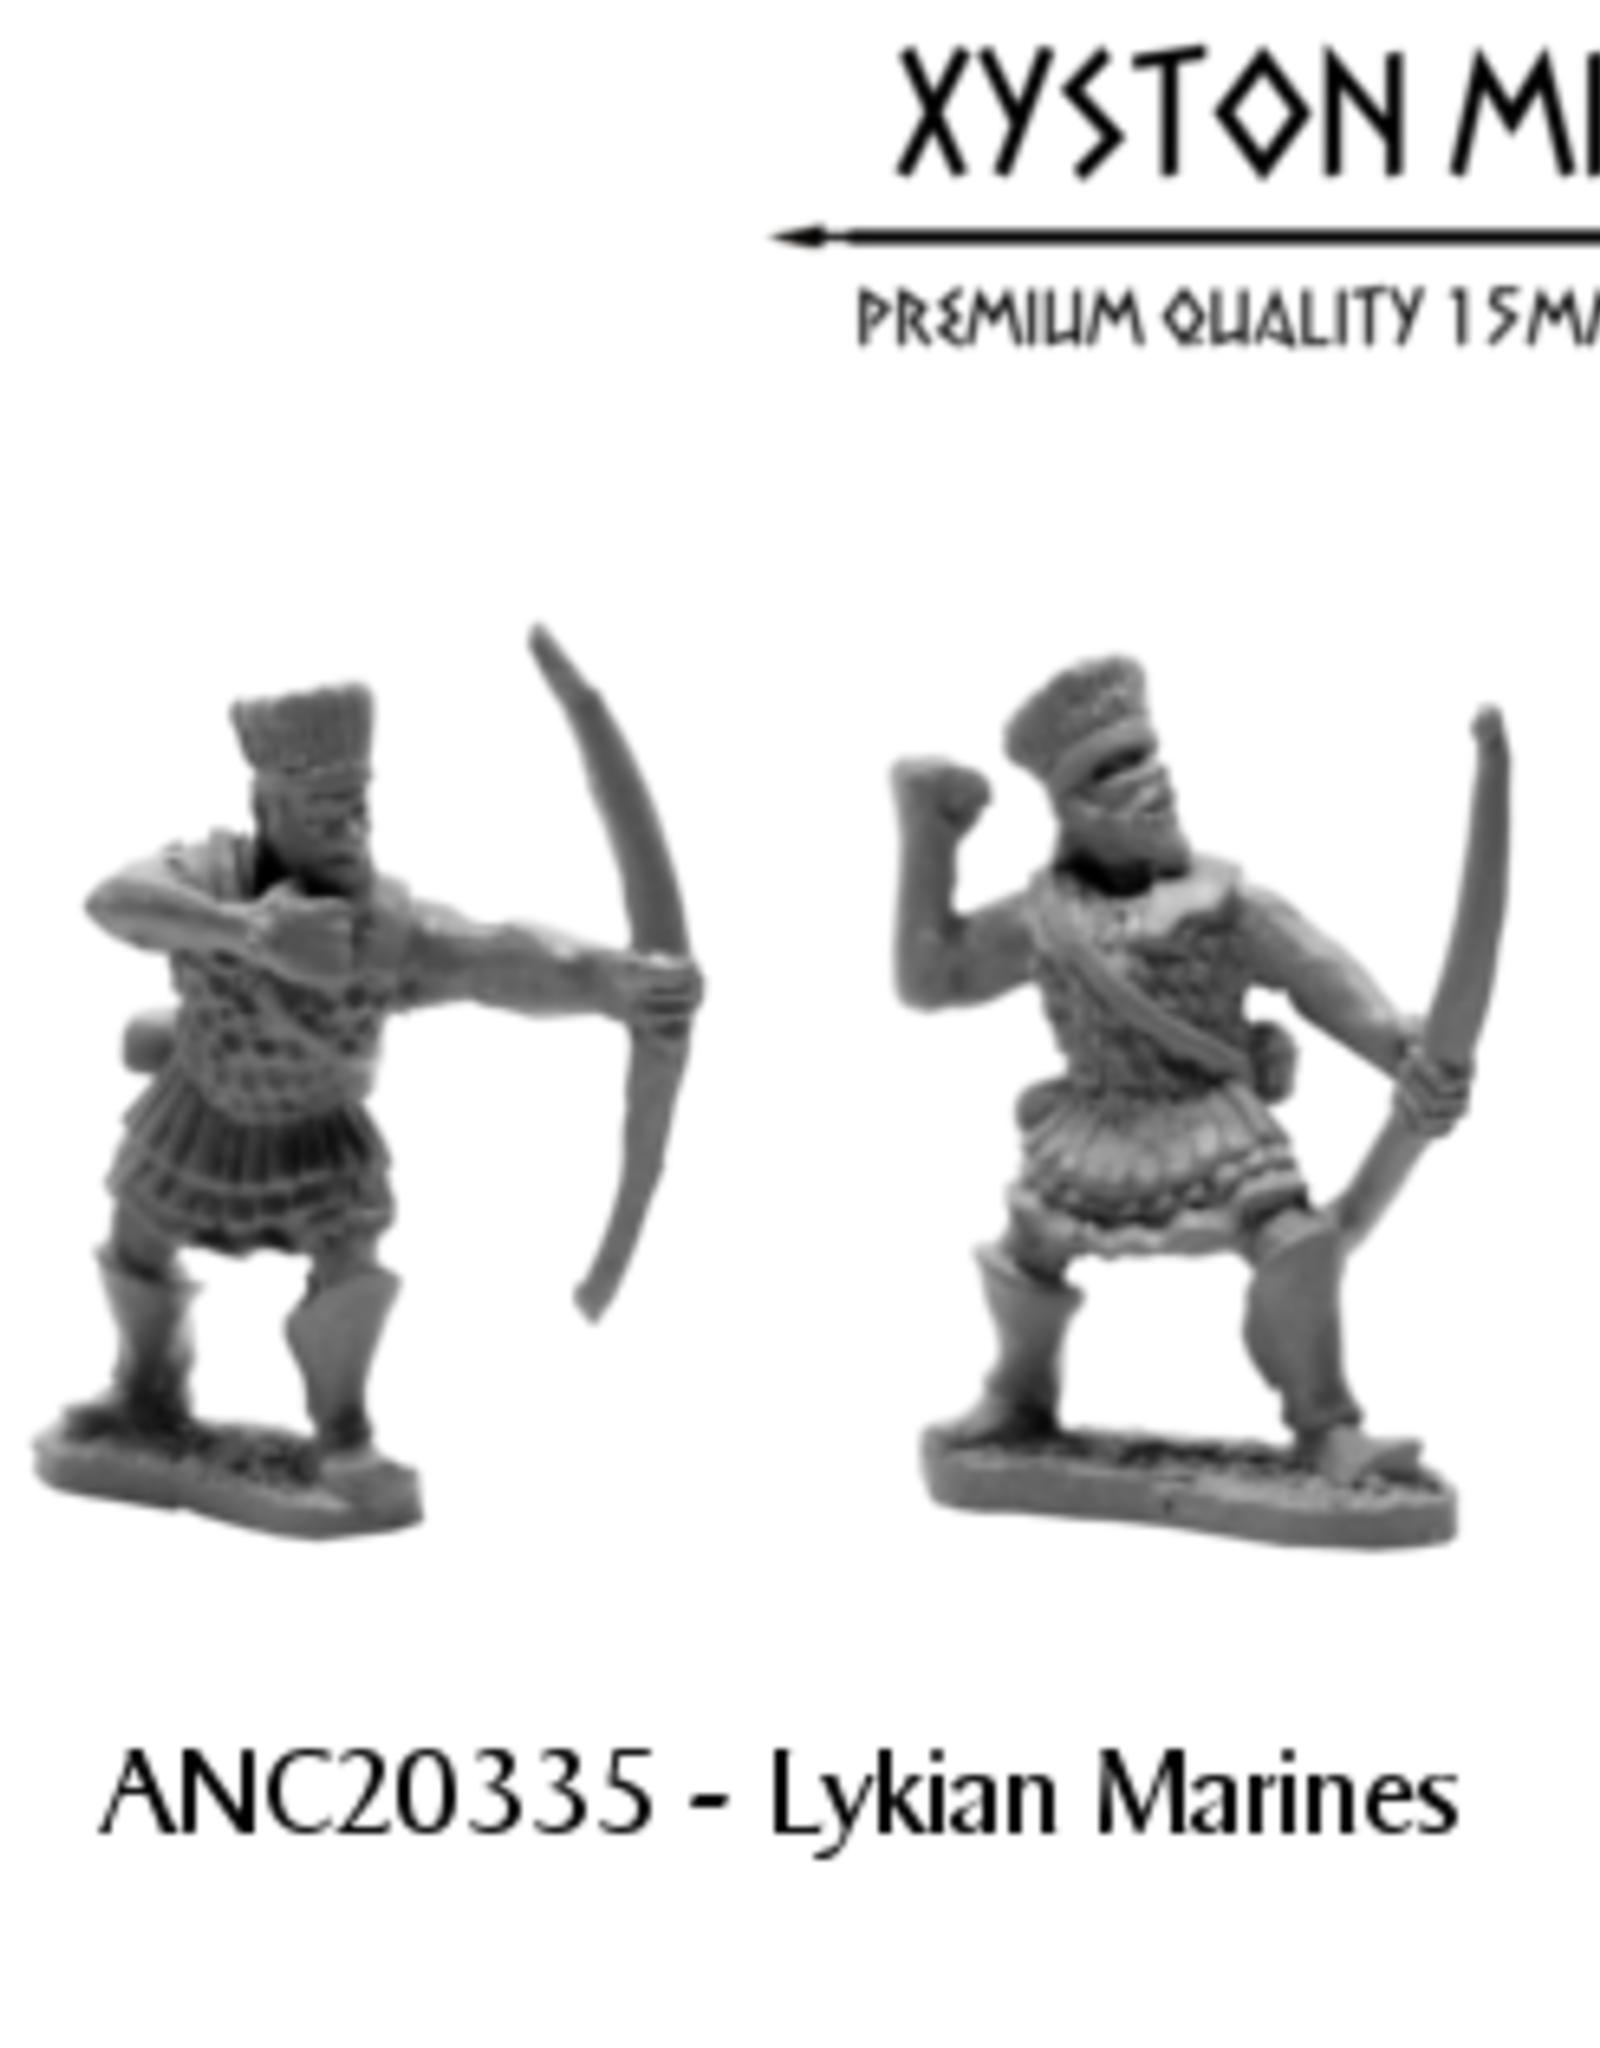 Xyston ANC20335 - Lykian Marines